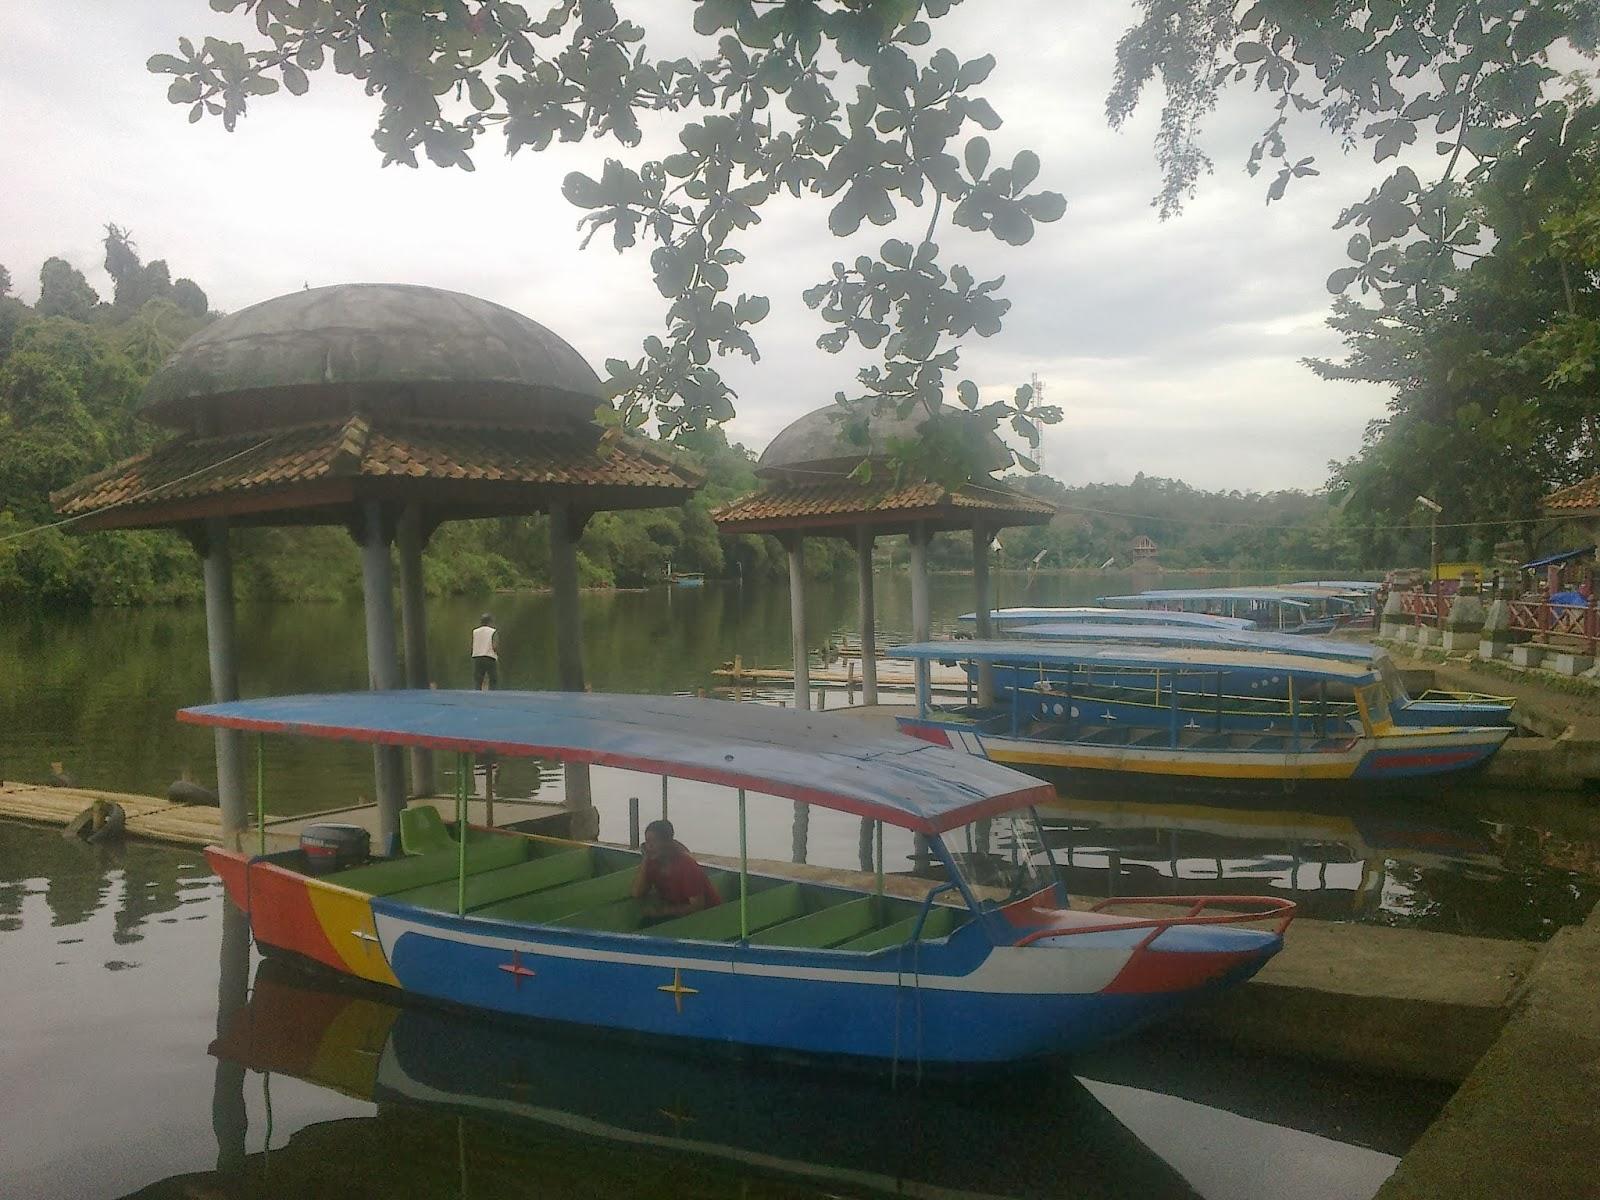 Objek Wisata Situ Lengkong Panjalu, Ciamis